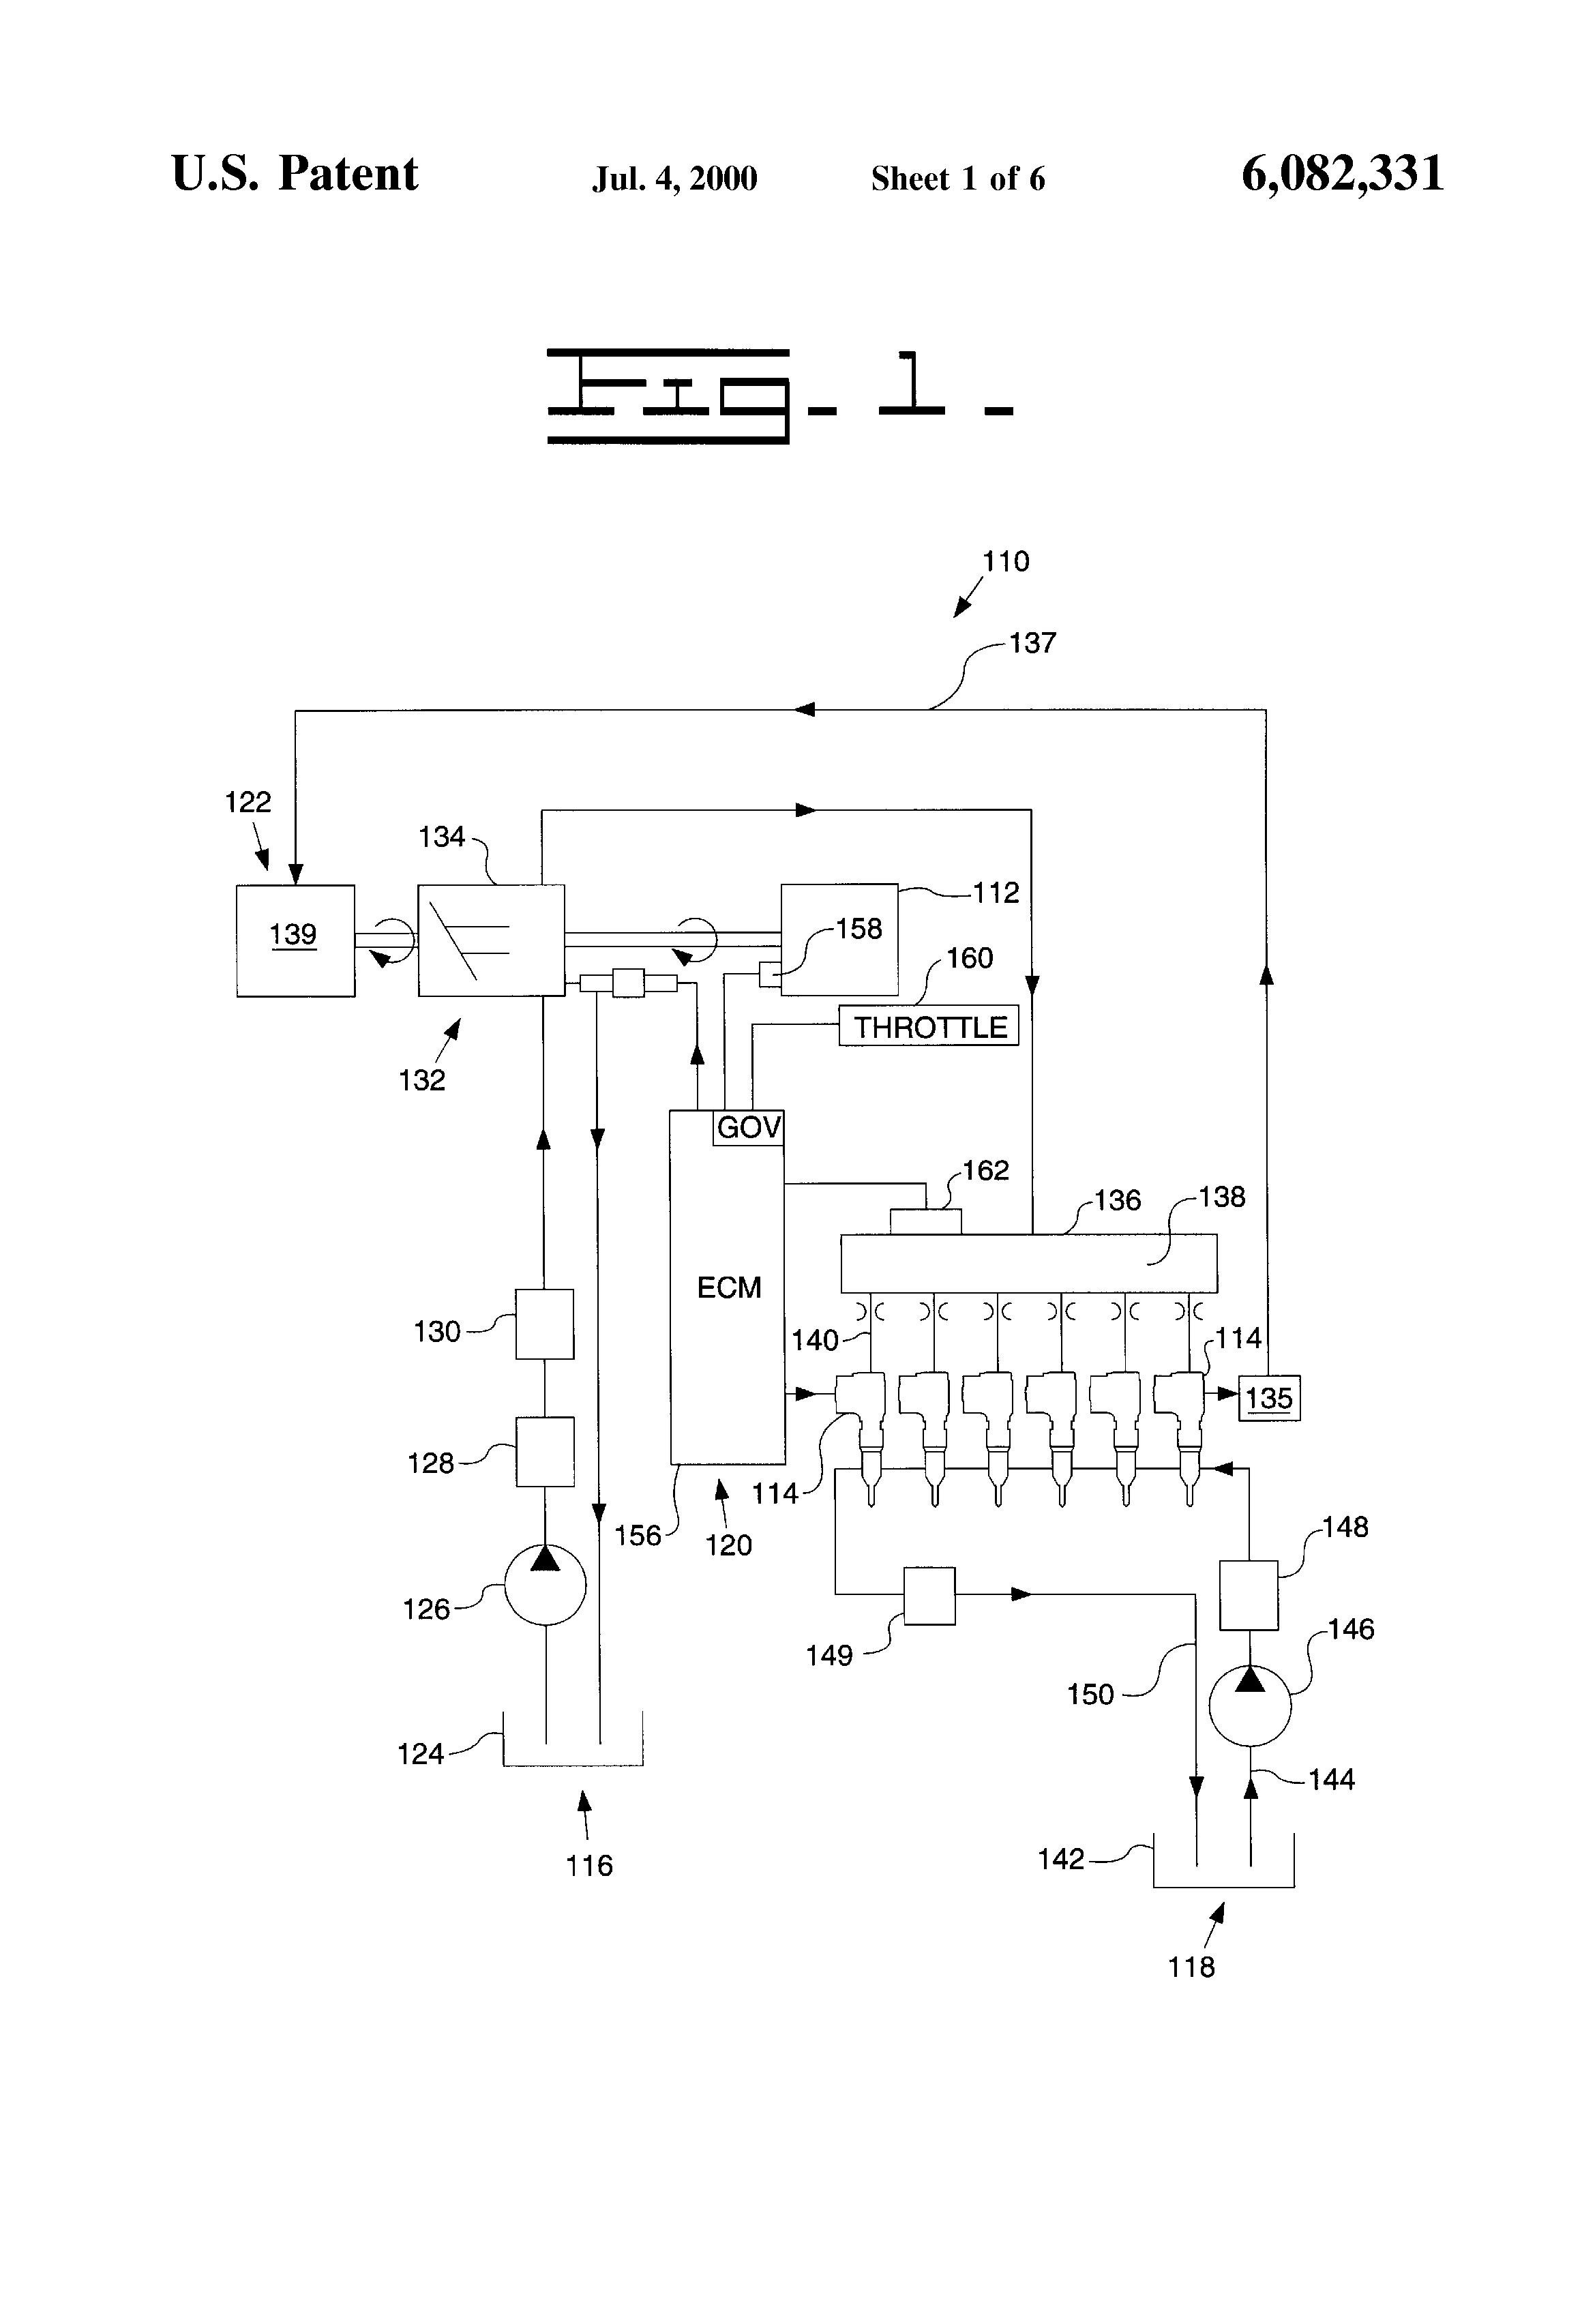 perkins 2300 series ecm wiring diagram pdf - wiring diagram perkins diesel wiring diagram #4